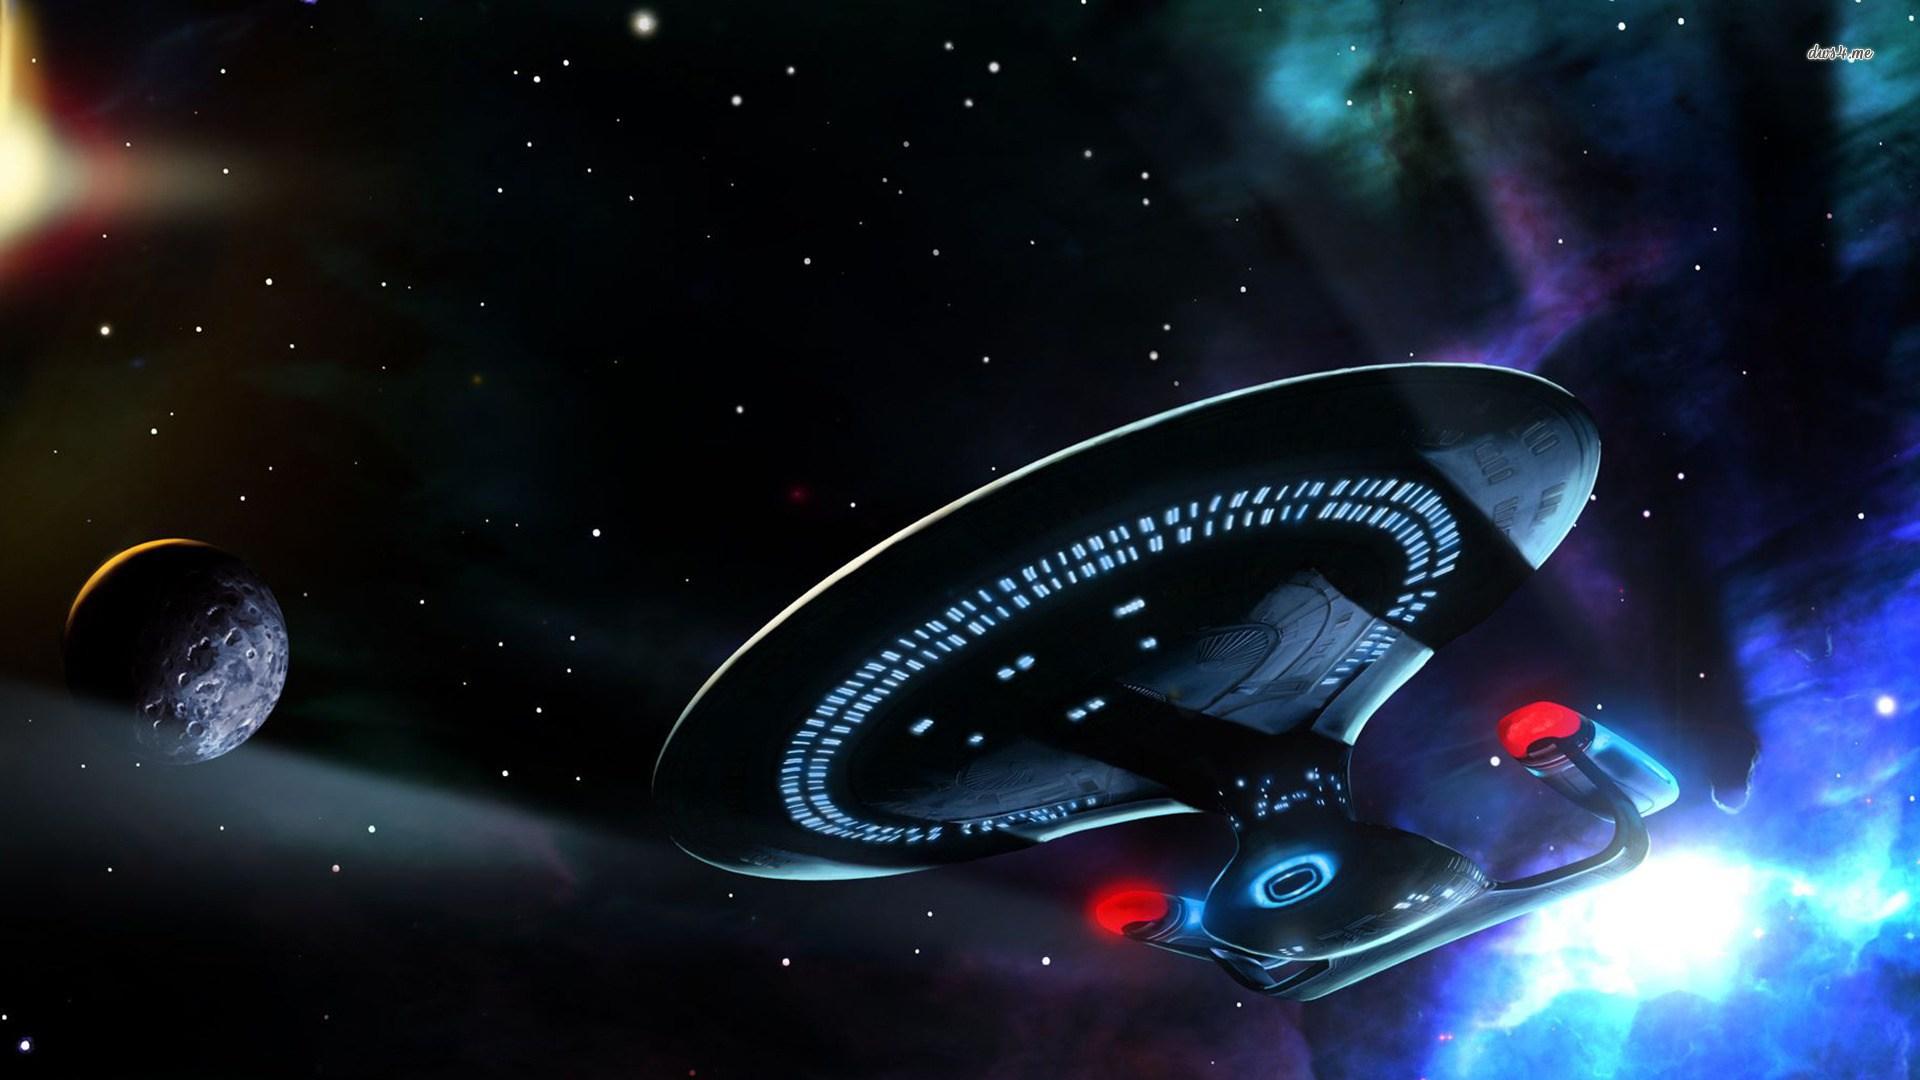 USS Enterprise   Star Trek into Darkness HD Wallpapers for Windows 8 1920x1080